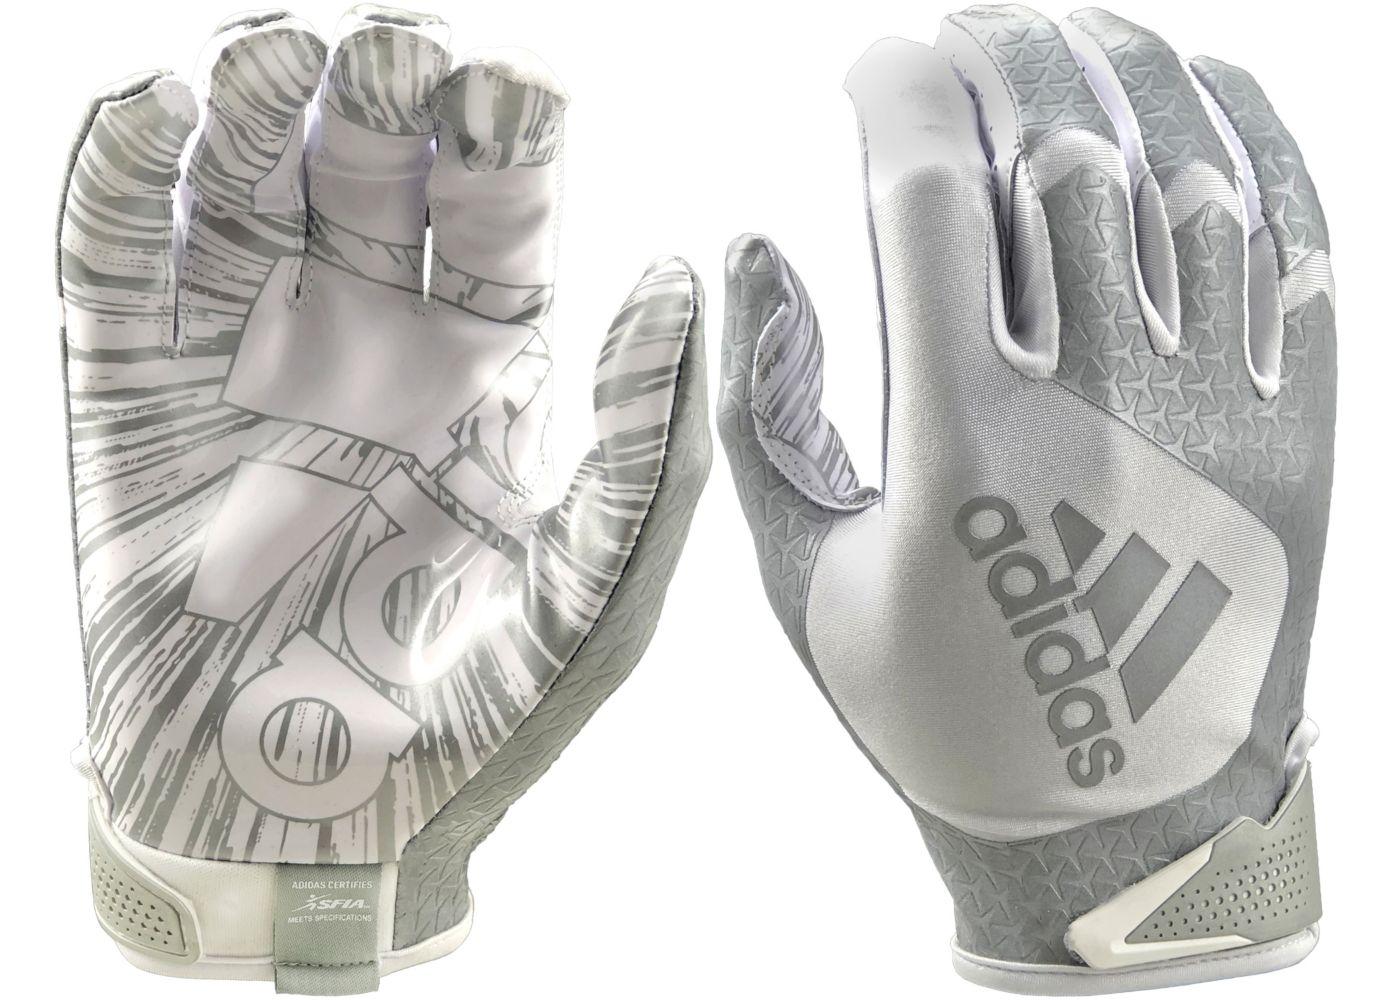 adidas Adult ScorchLight 5.0 Receiver Gloves